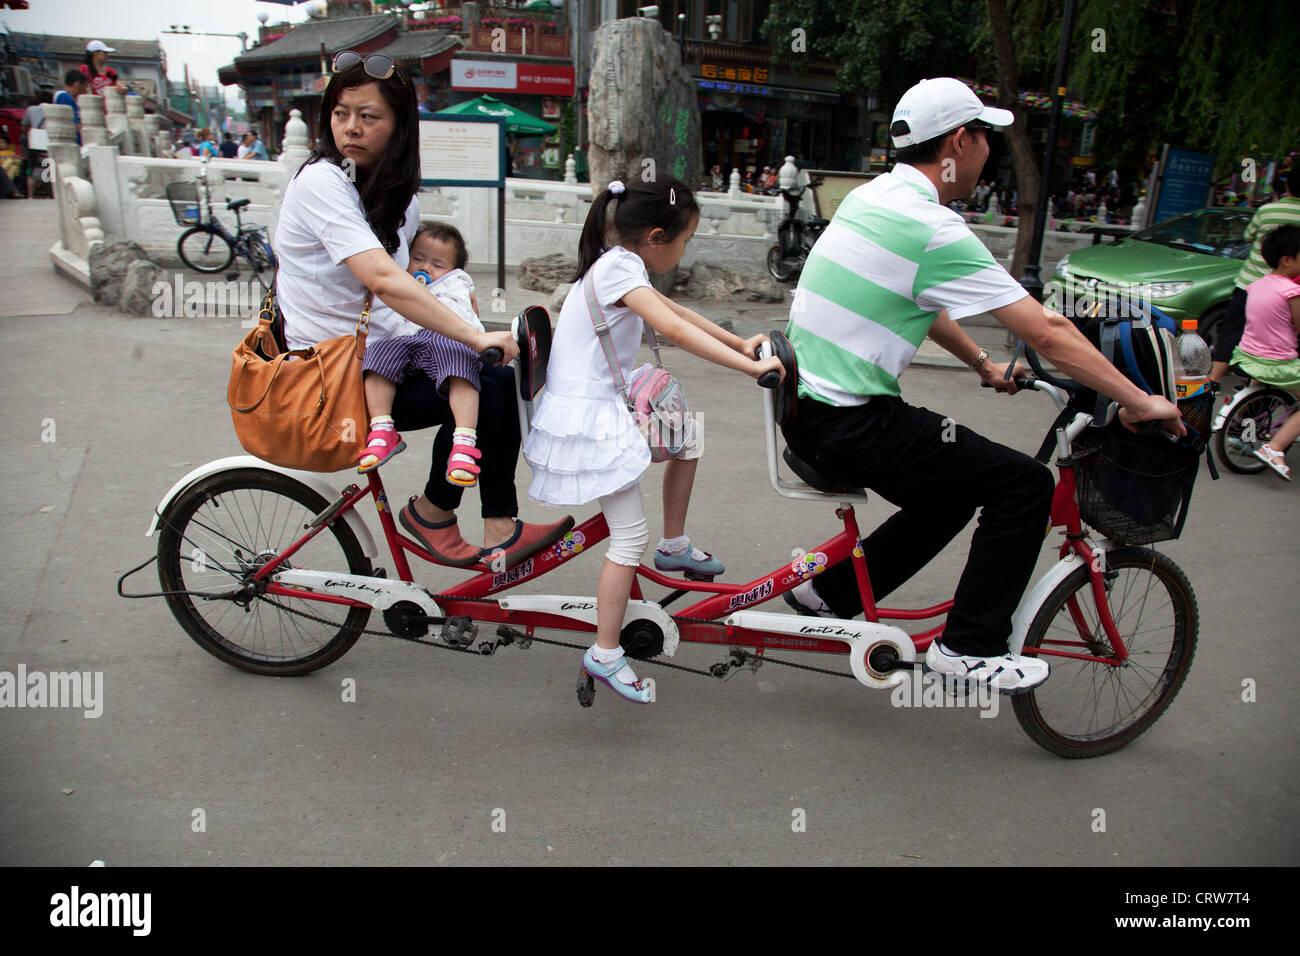 Family riding along on a triple tandem bicycle in Shichahai area, near to Yandai Xiejie and Yinding Bridge, Beijing, - Stock Image